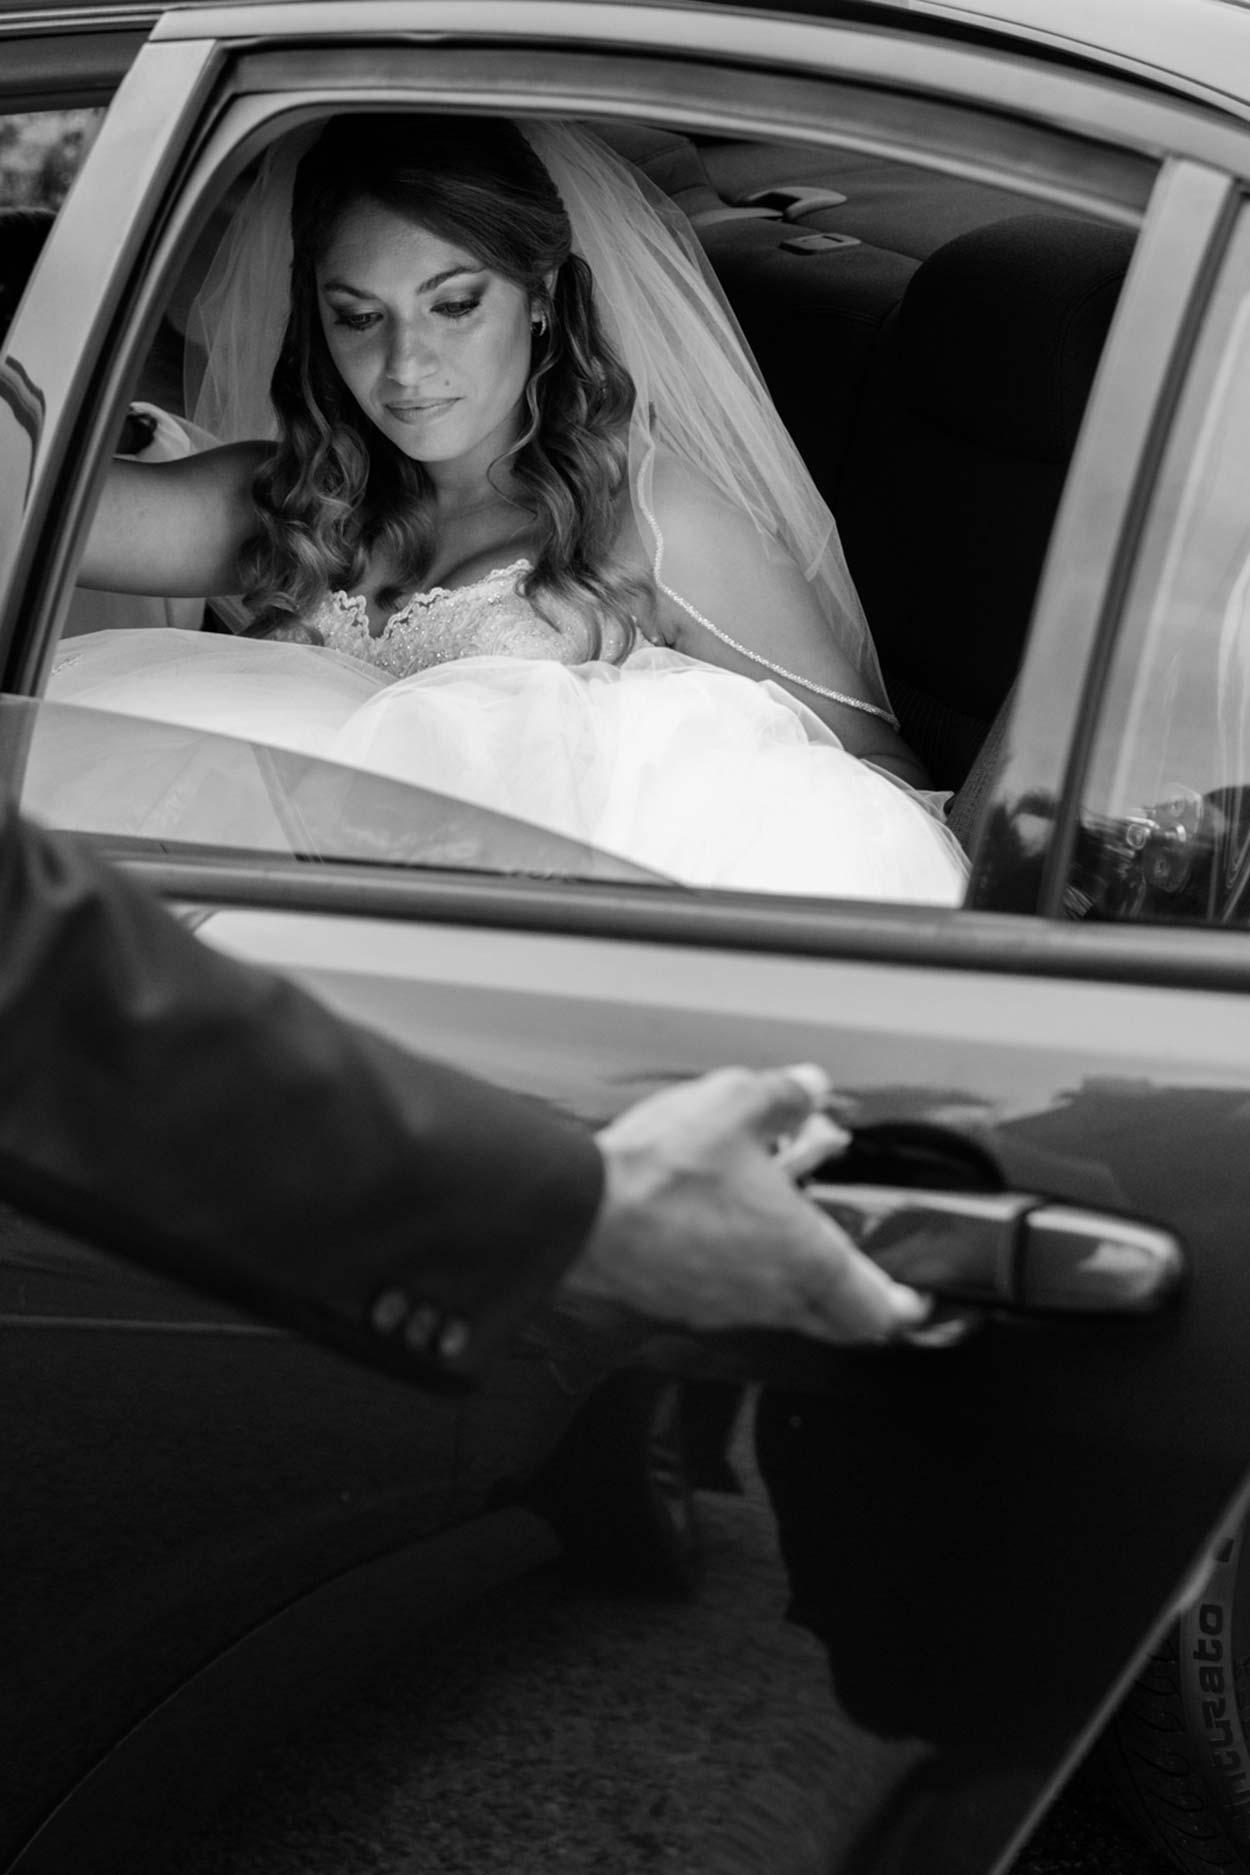 sunshine-coast-destination-wedding-photographers-brisbane-queensland-australian-maleny-noosa-beach-hinterland-montville-flaxton-gold-caloundra-elopement-photos-best-recommended-eco-friendly-packages-45.jpg